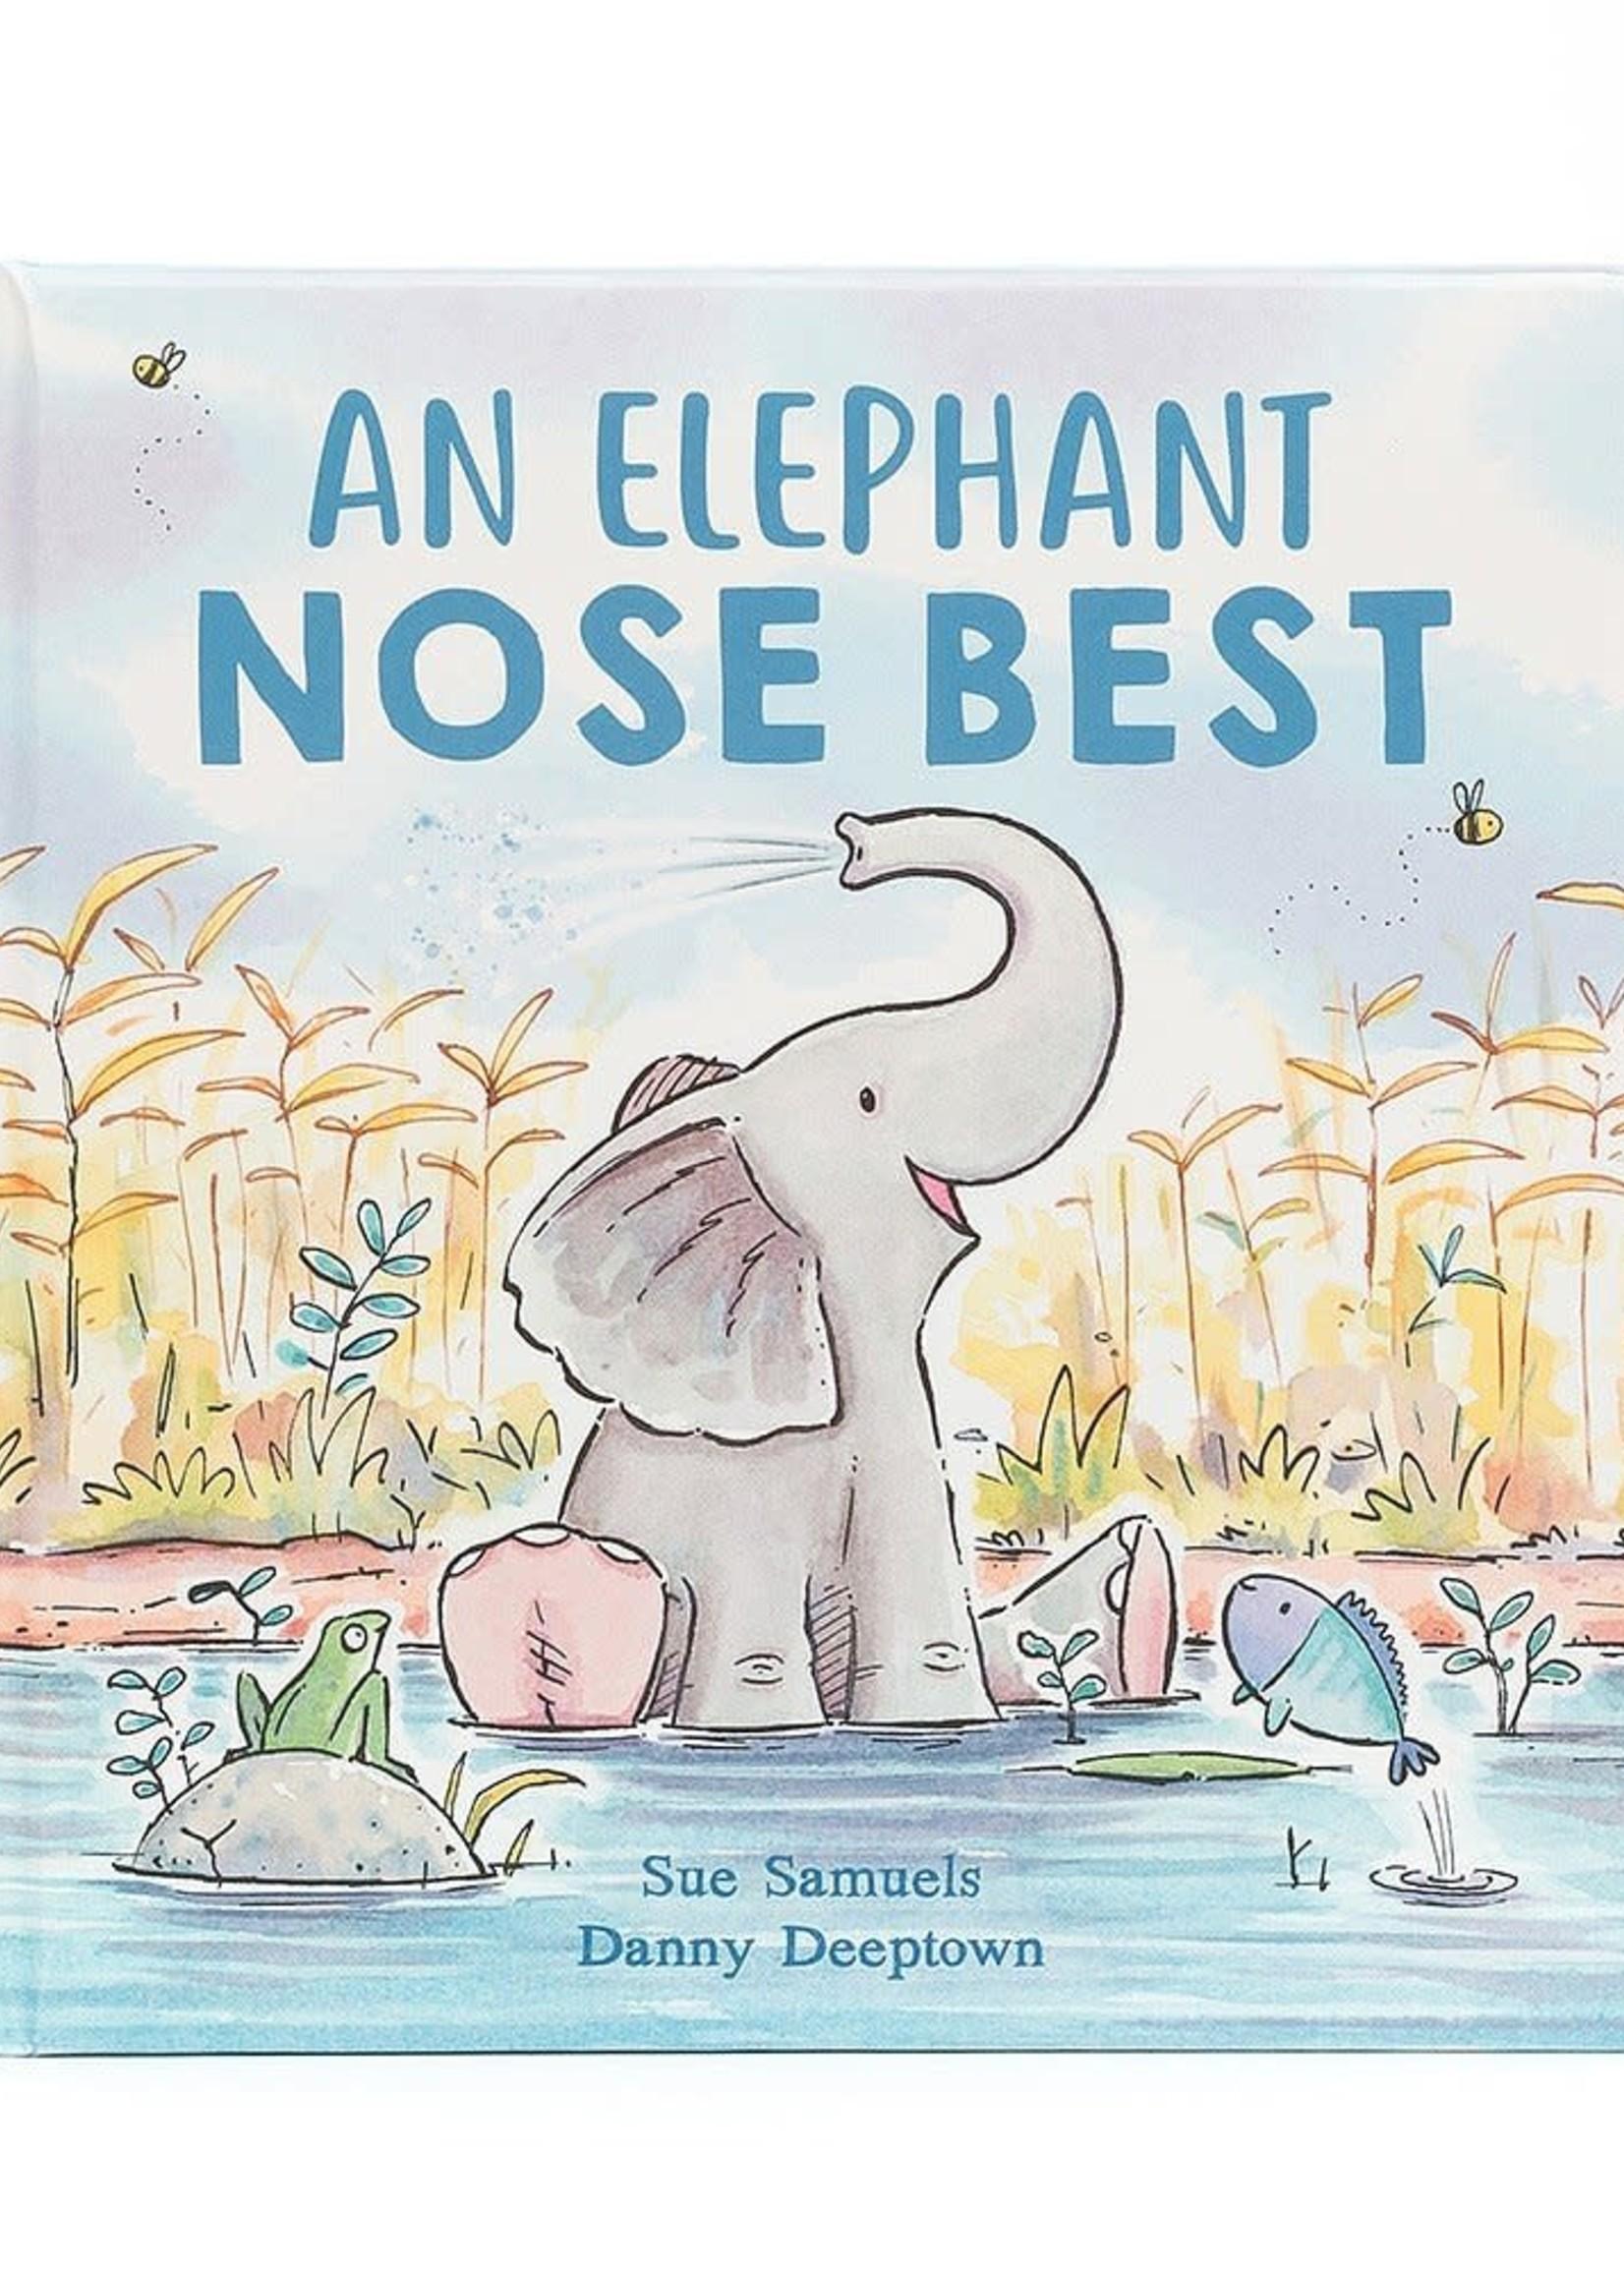 JELLY CAT JELLYCAT AN ELEPHANT NOSE BEST BOOK